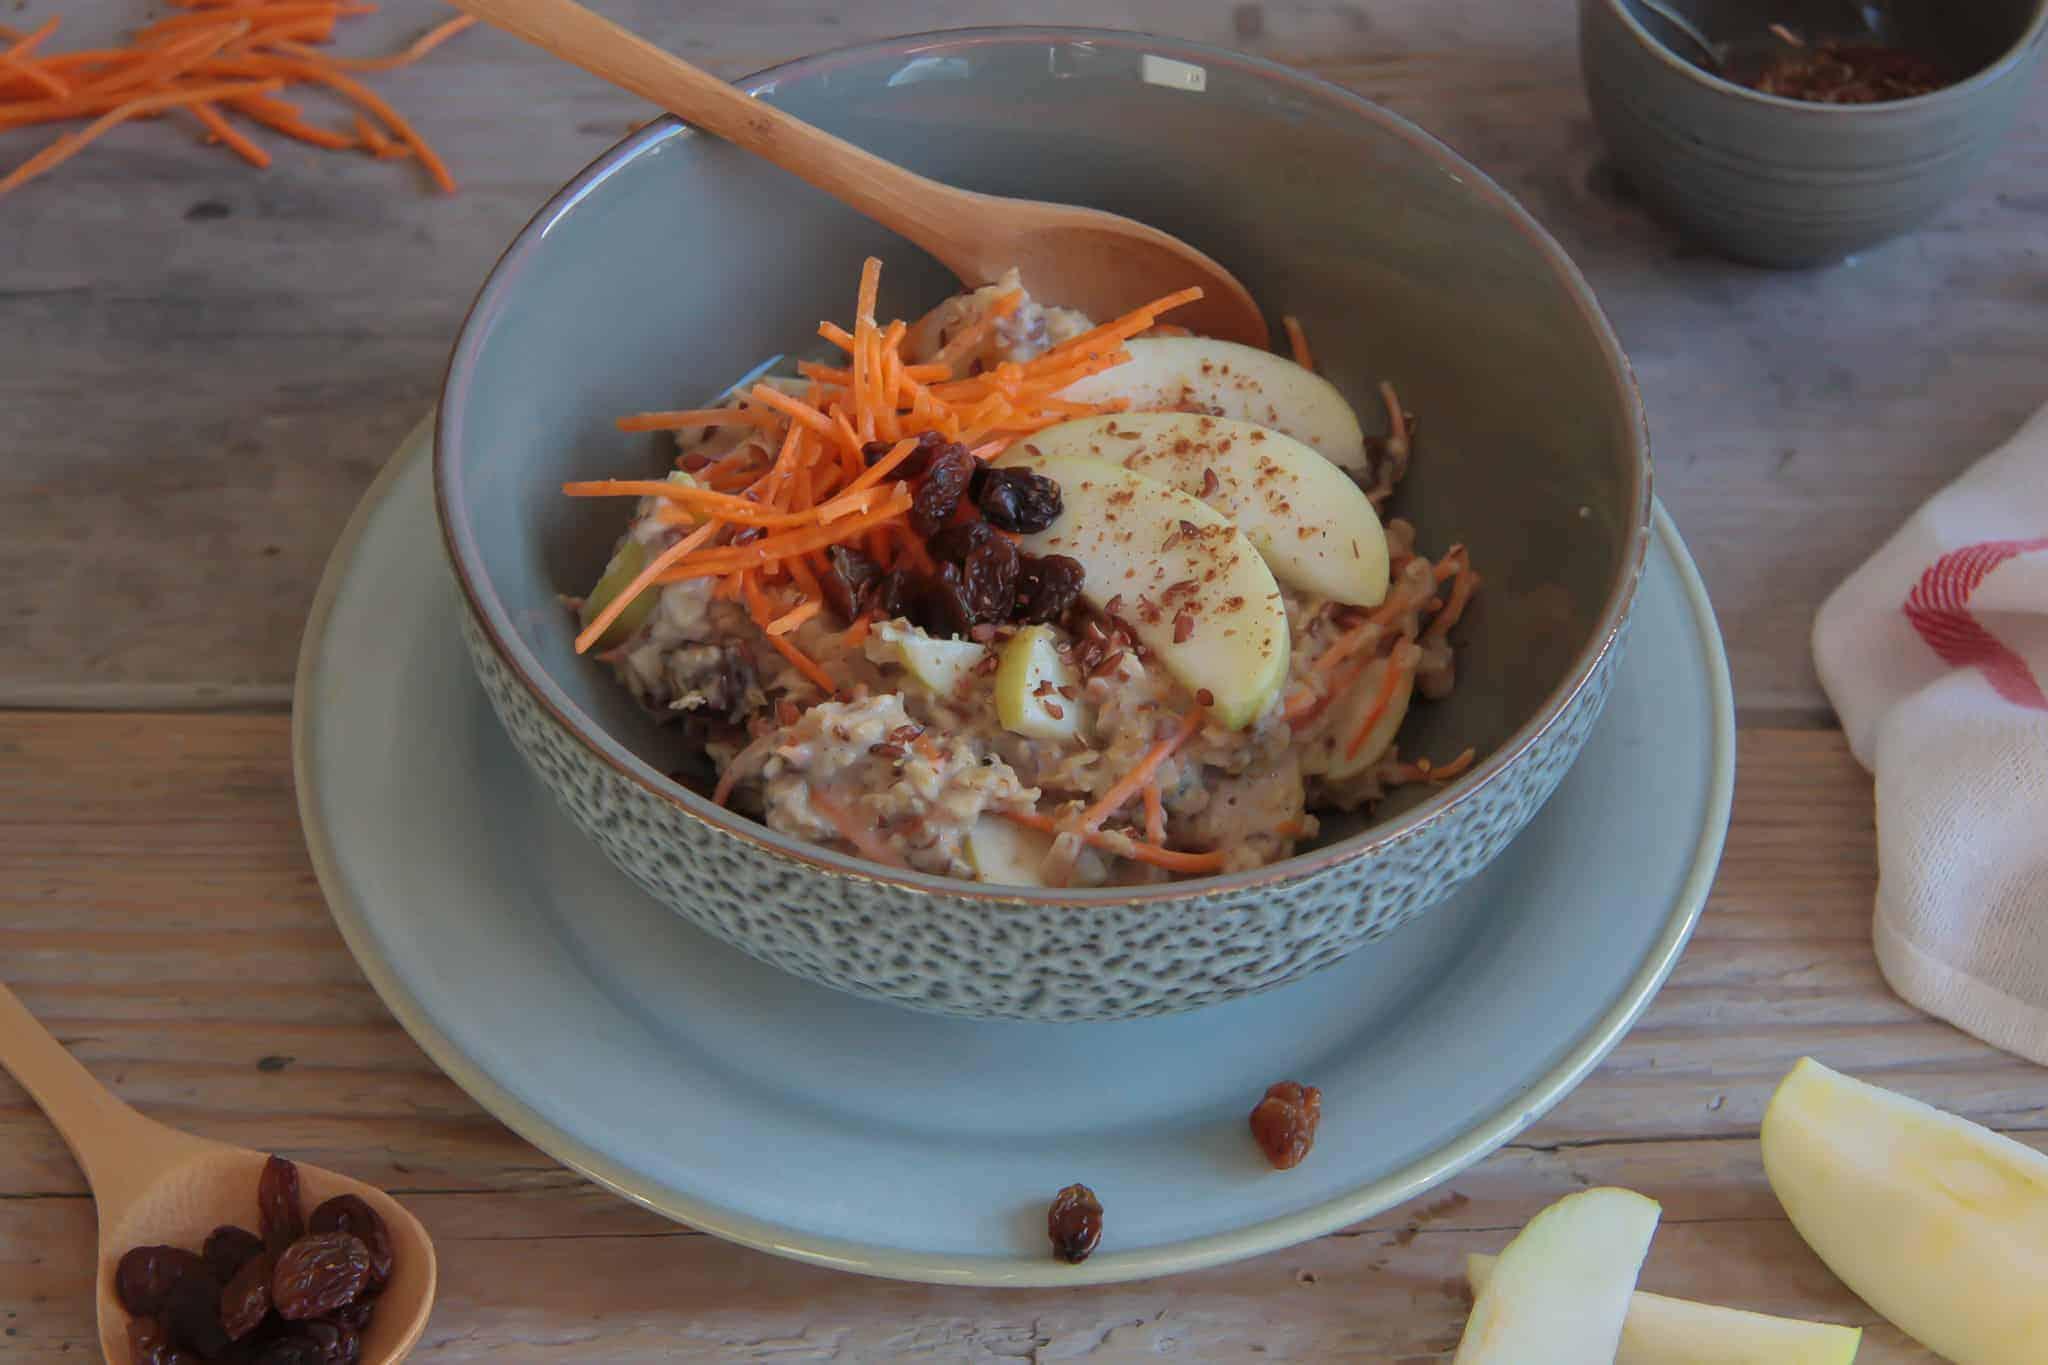 carrotcake, wortel, ontbijt